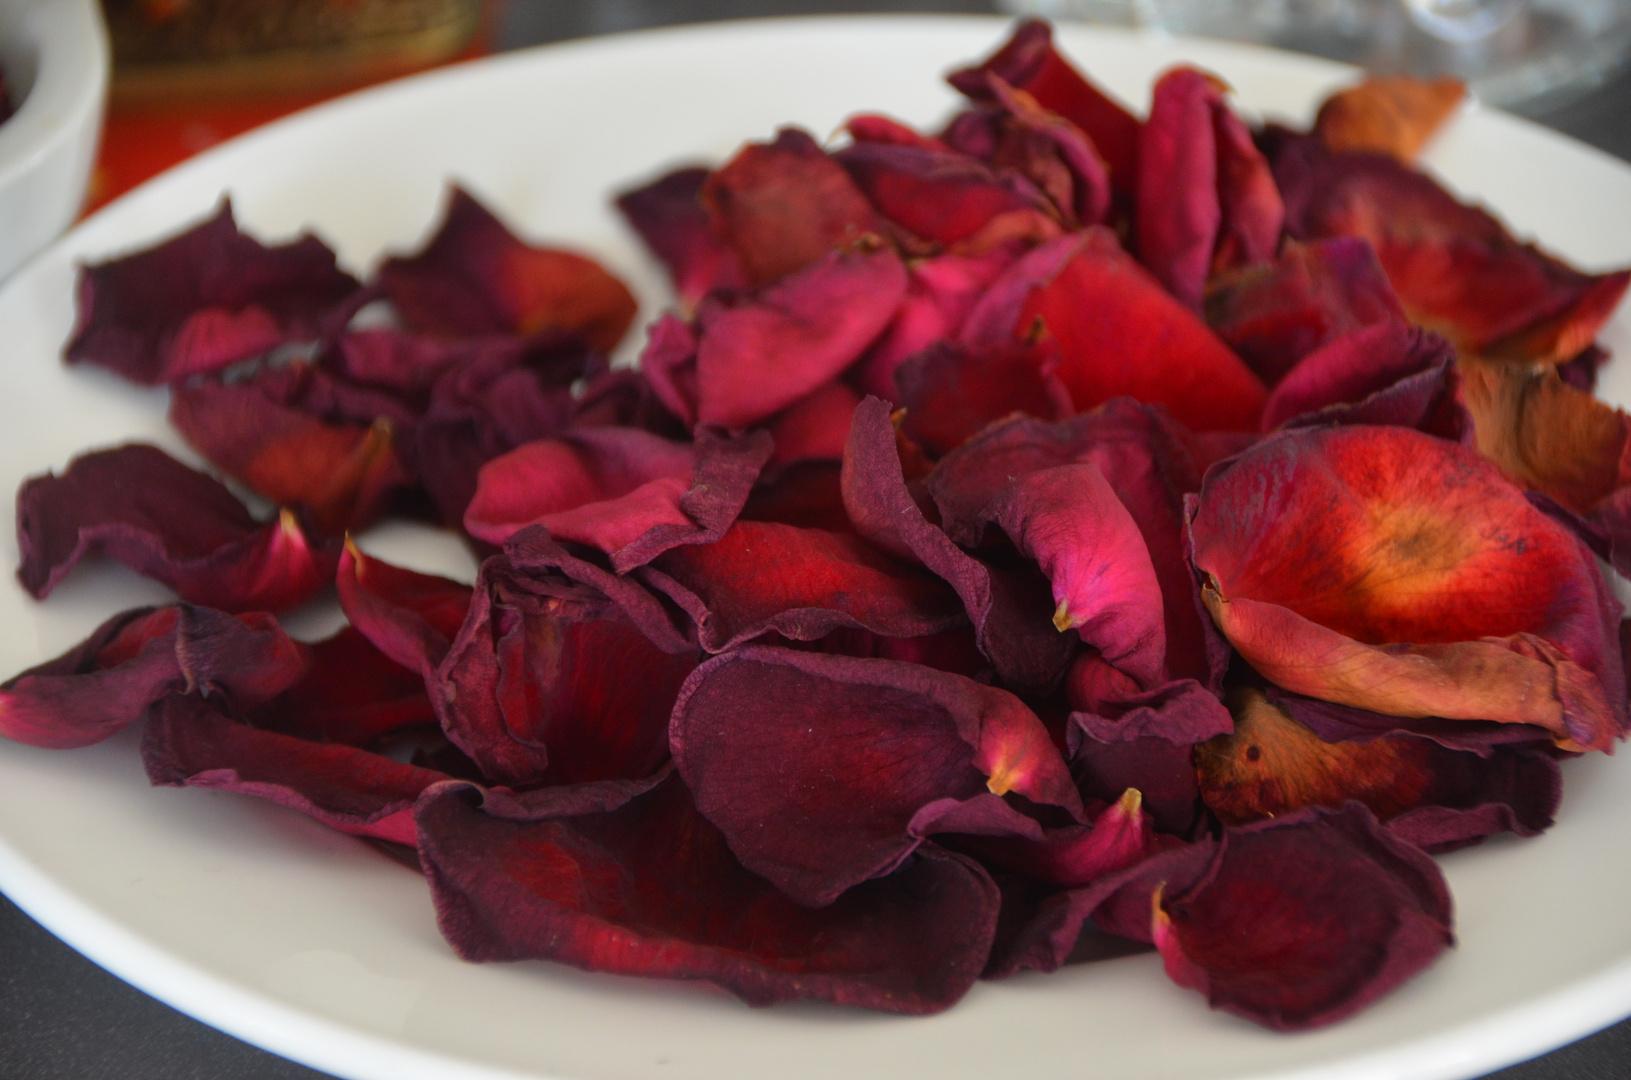 Einfach Rosenblütenblätter :)